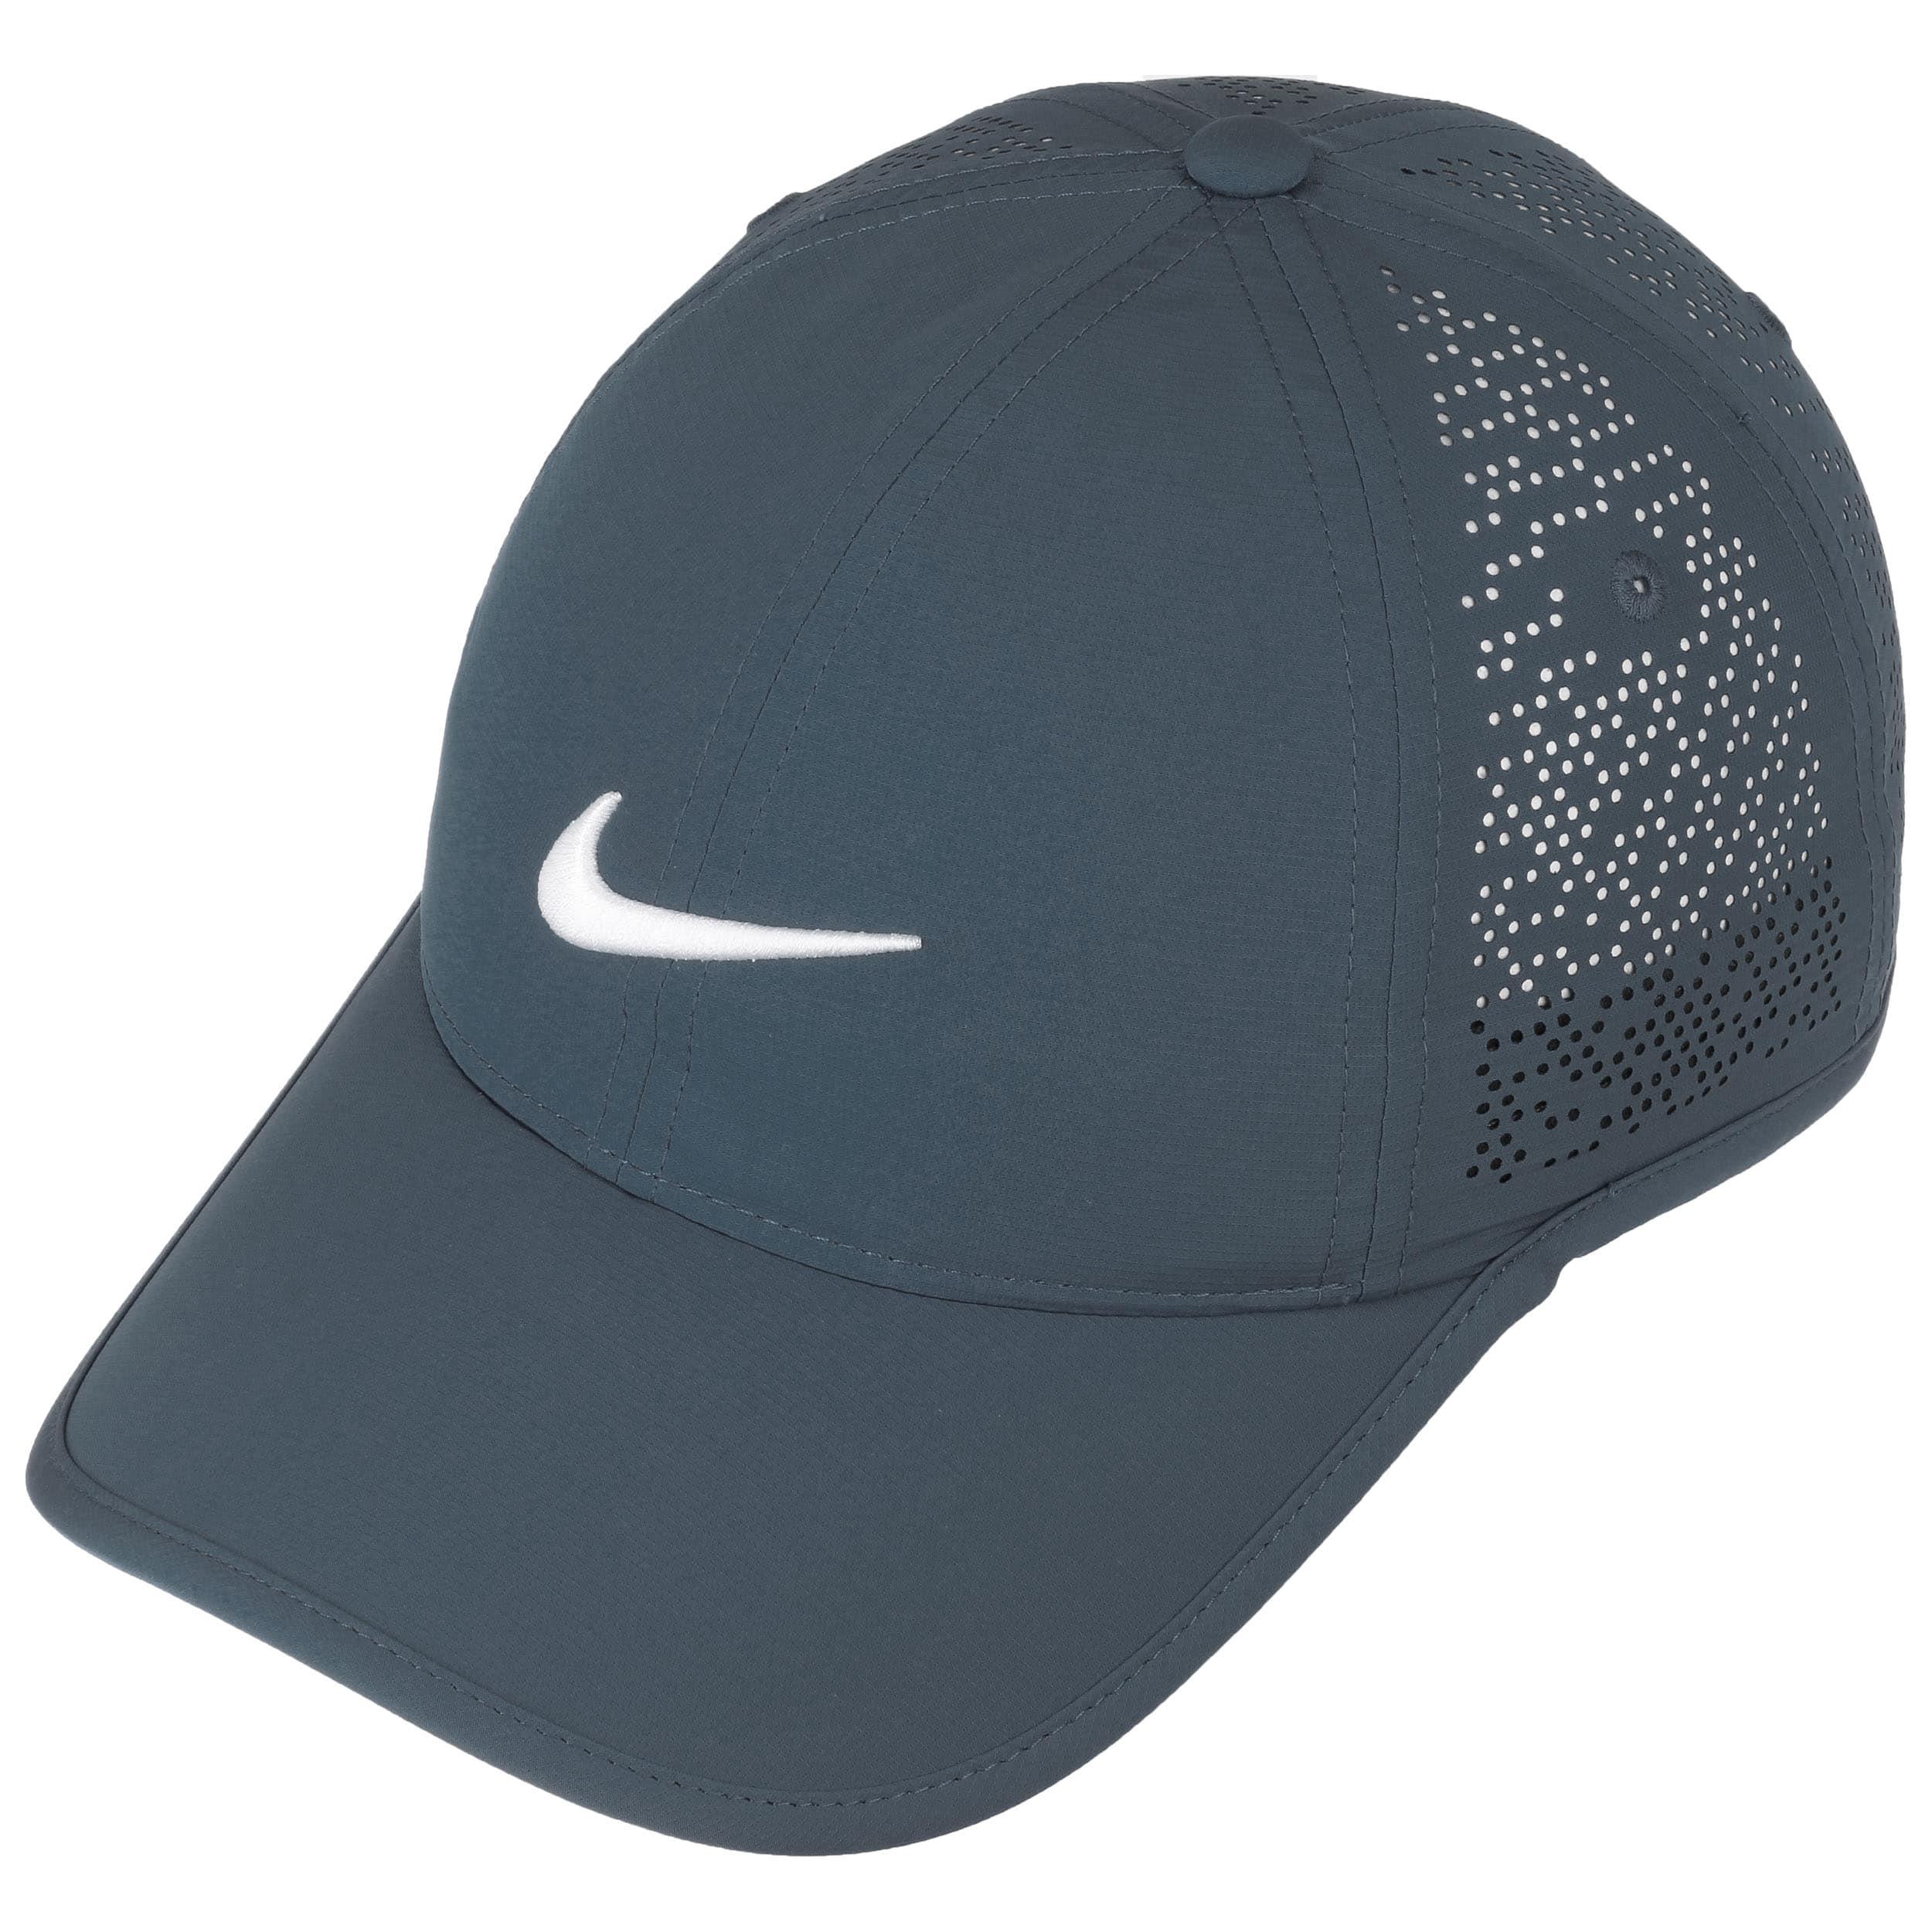 a56235e4a80ab Gorra Swoosh Perforation Cap by Nike - Gorras - sombreroshop.es